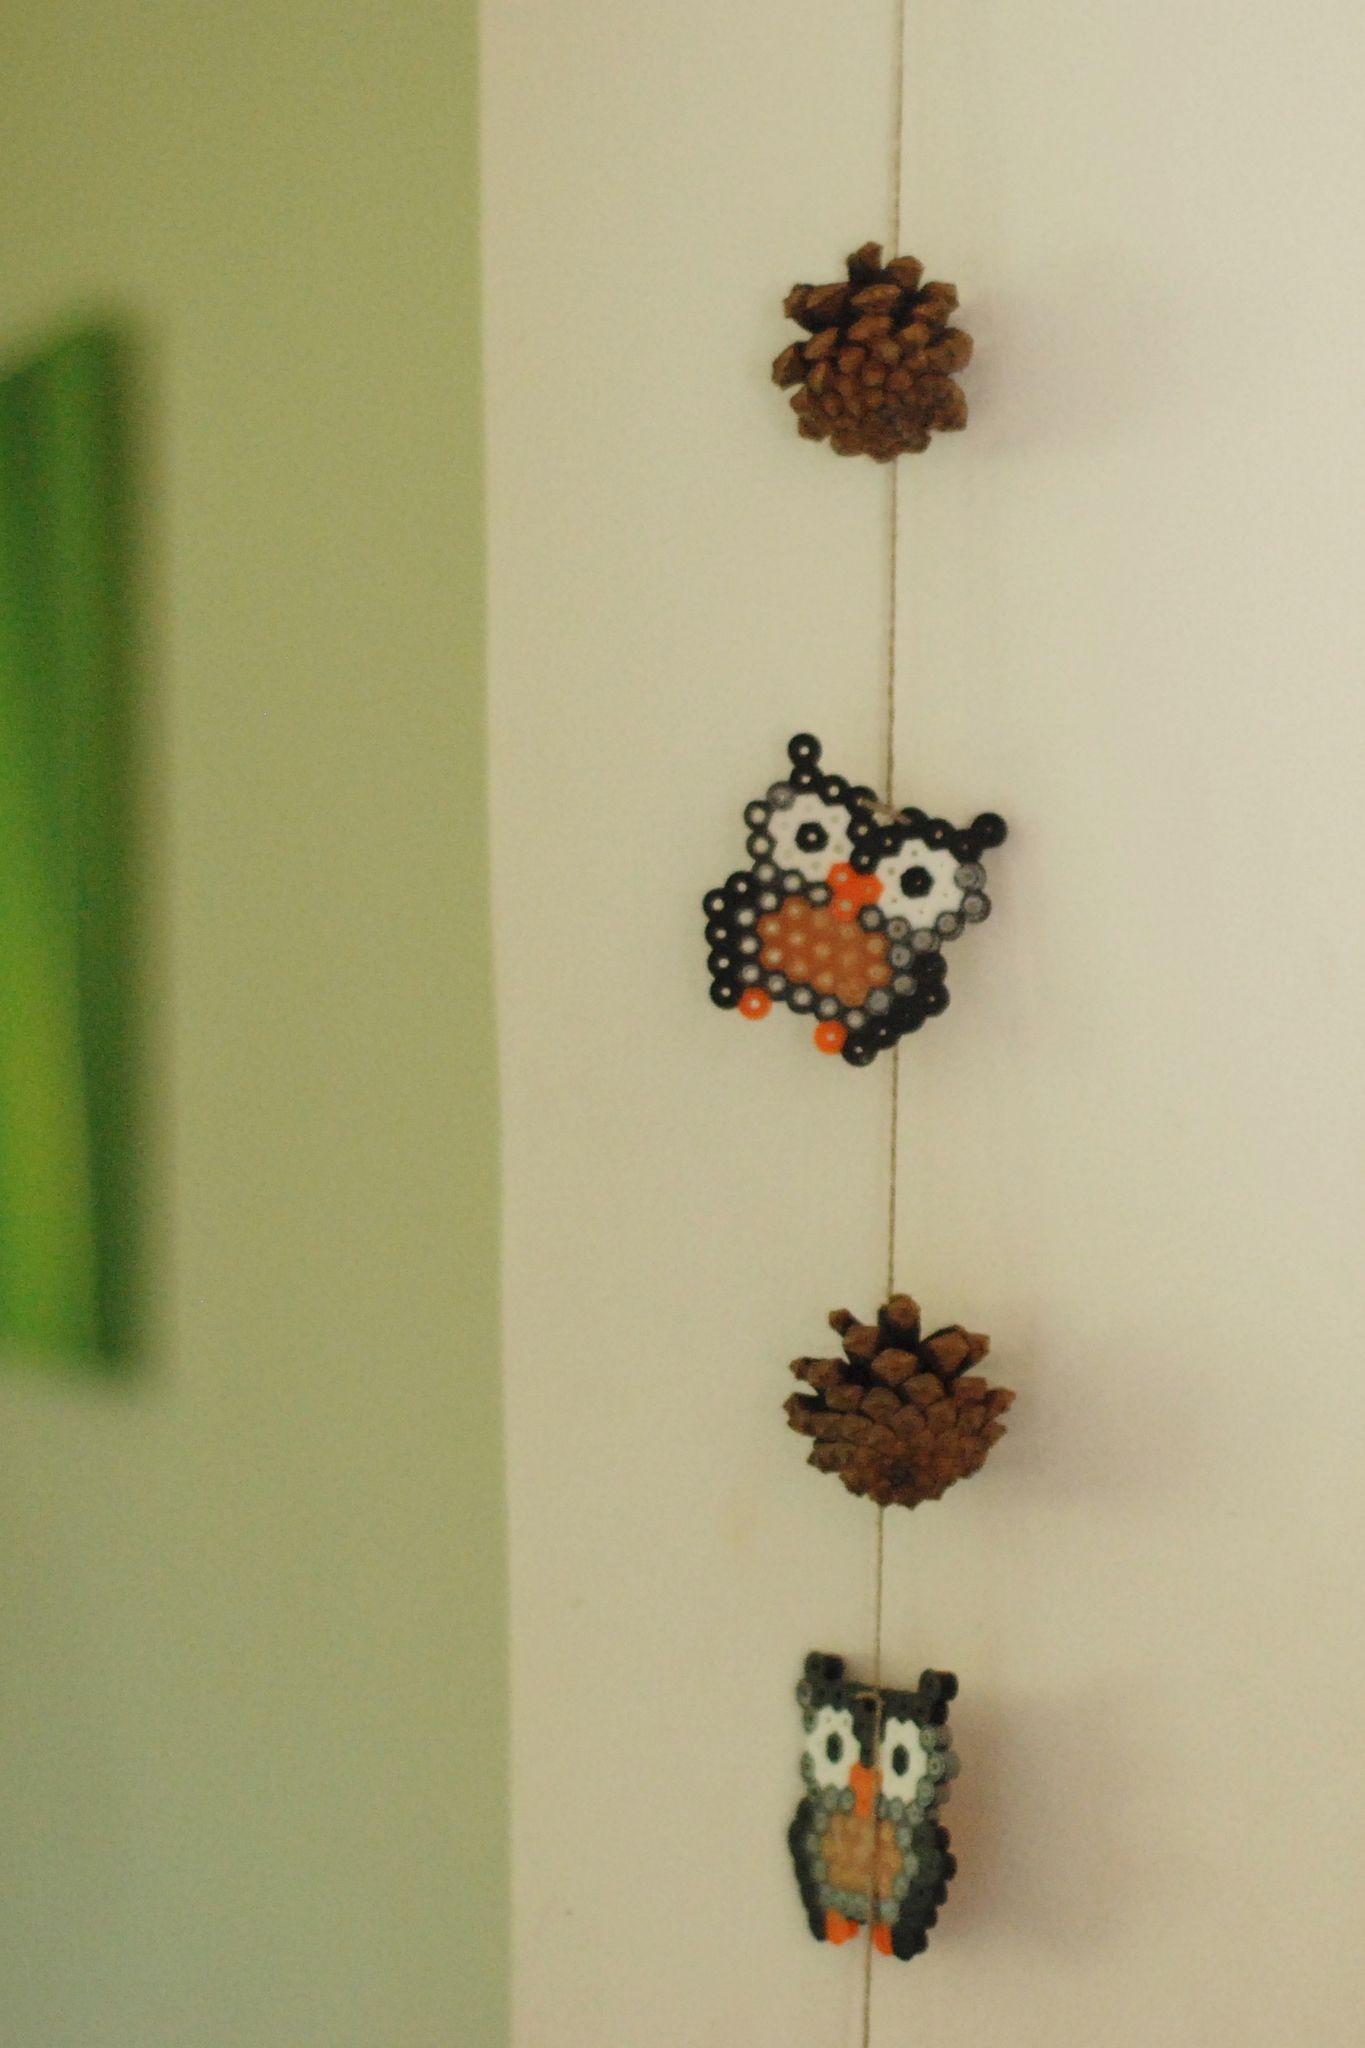 activit s avec enfants guirlande de hiboux en perles repasser hama midi perles pinterest. Black Bedroom Furniture Sets. Home Design Ideas